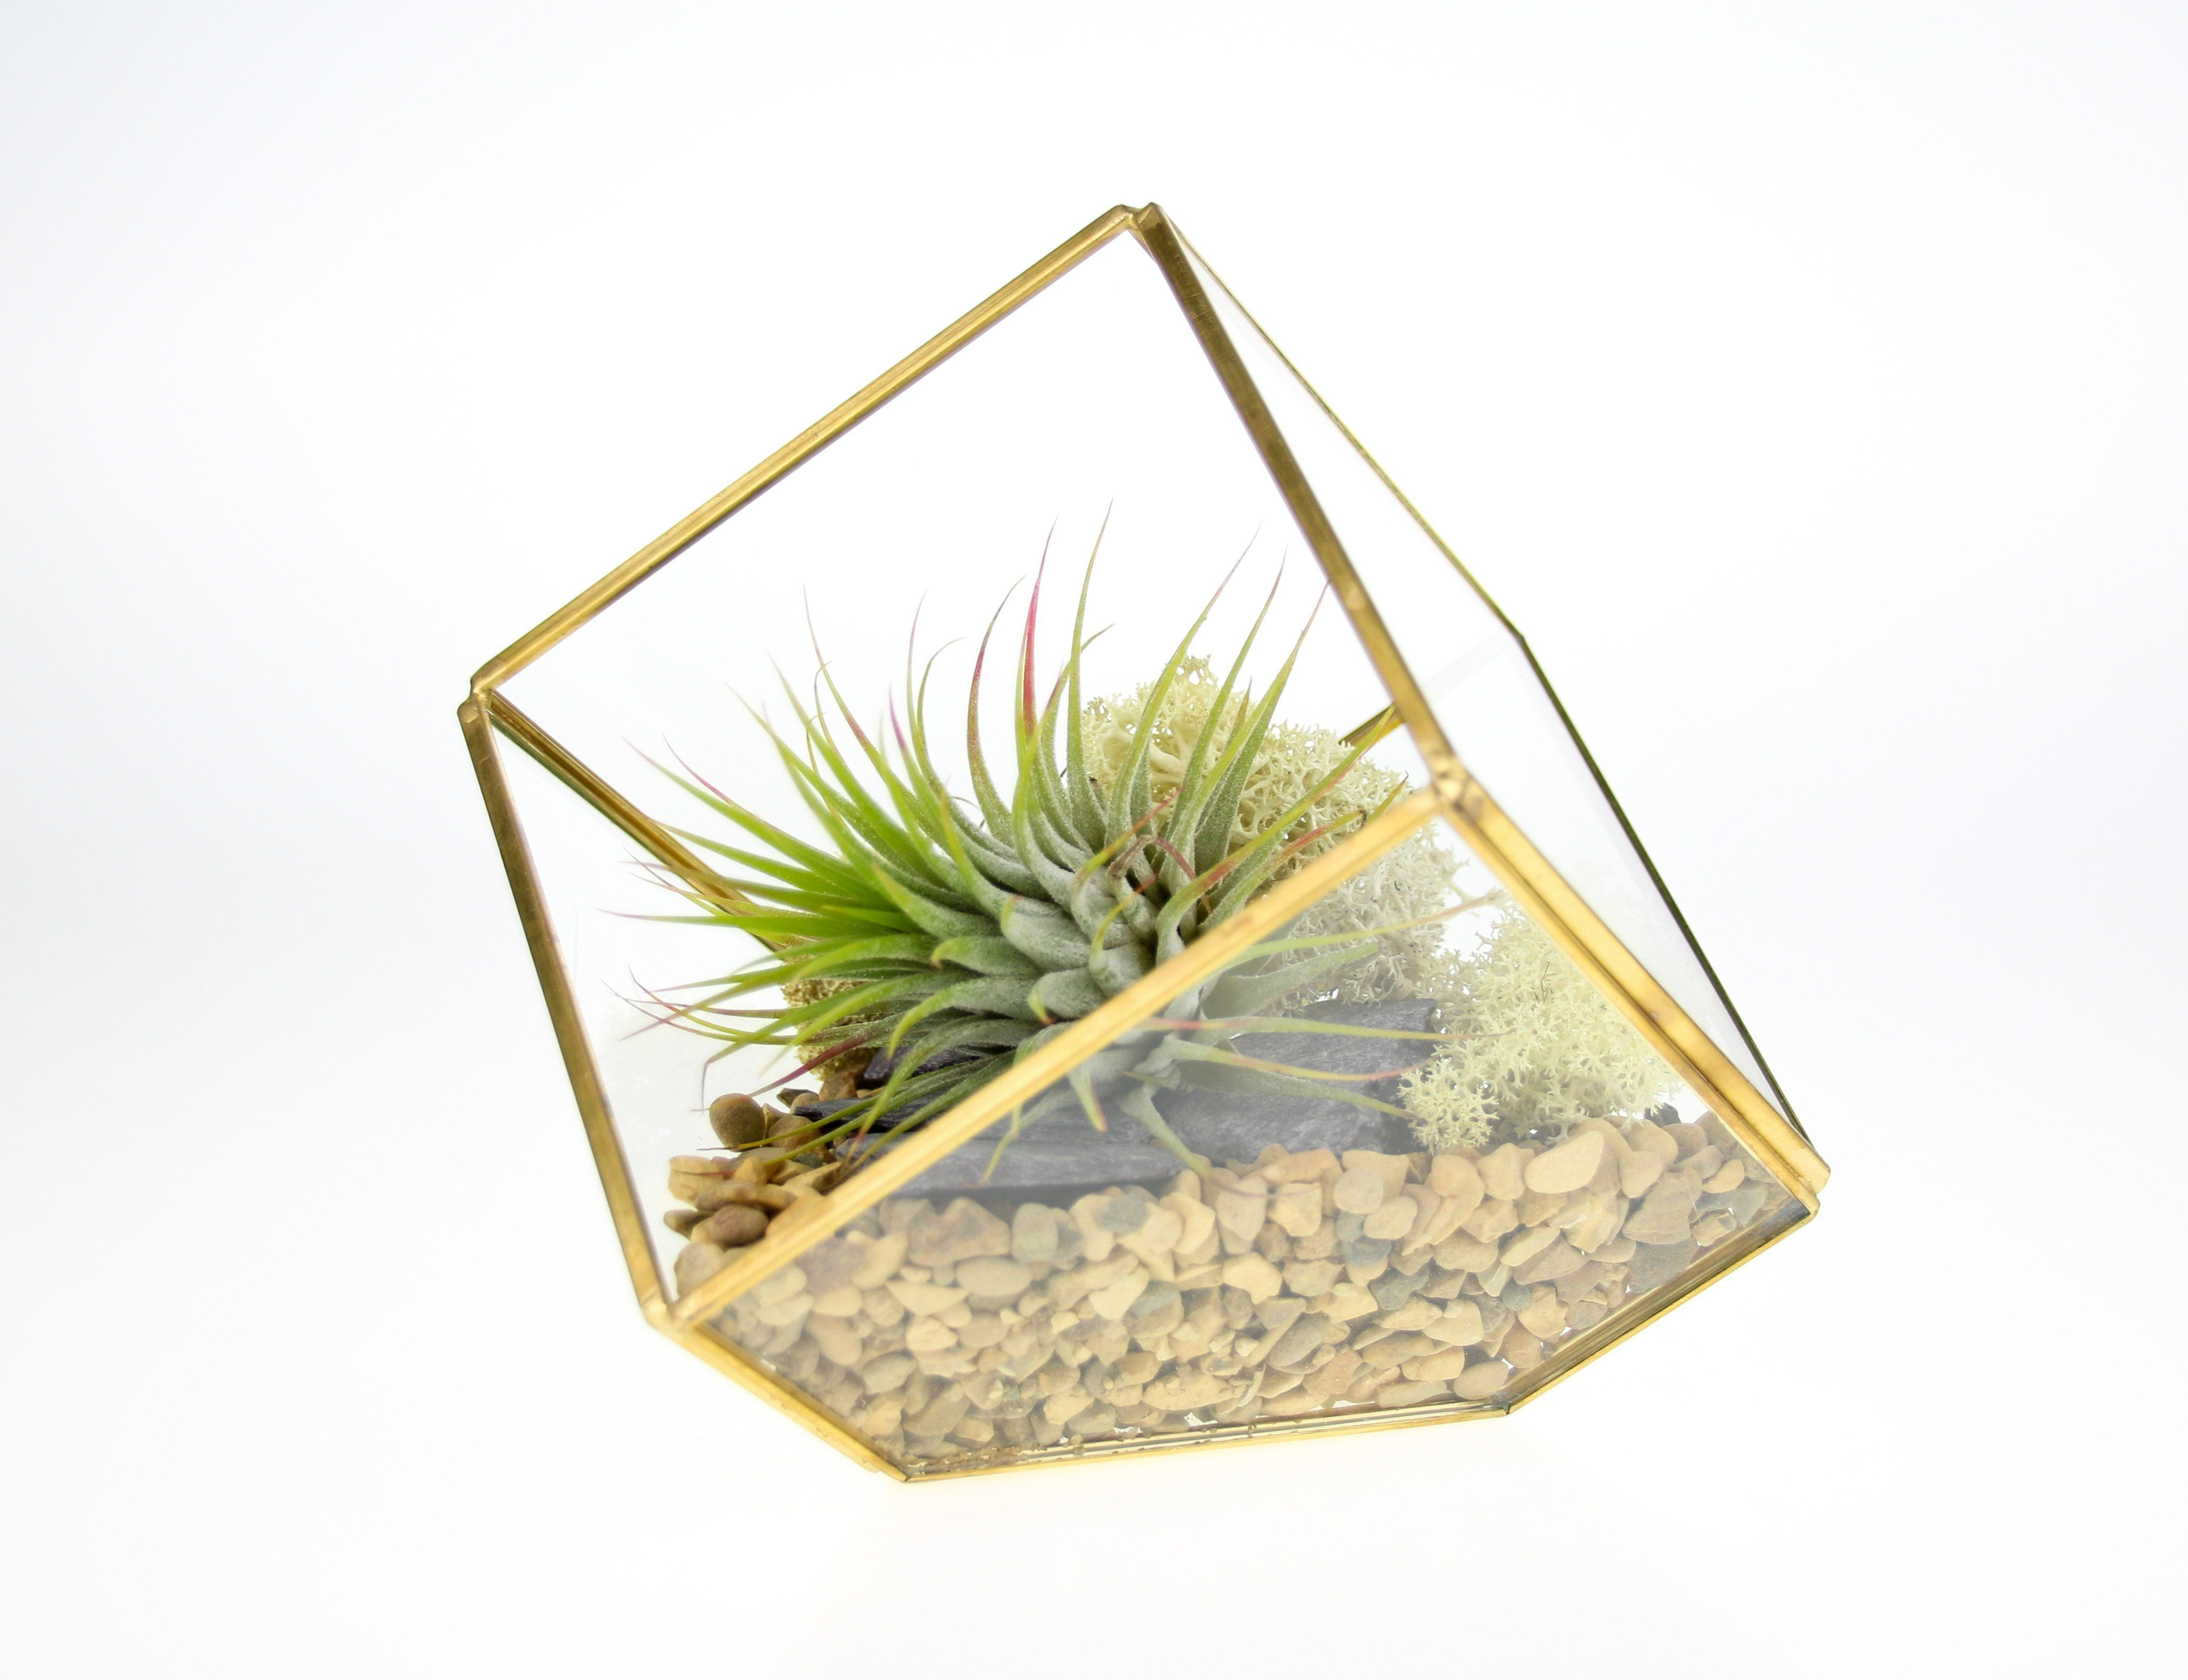 Square Geometric Terrarium Kit with an Elegant Air Plant - Complete Kit - Natural Gravel & White Moss